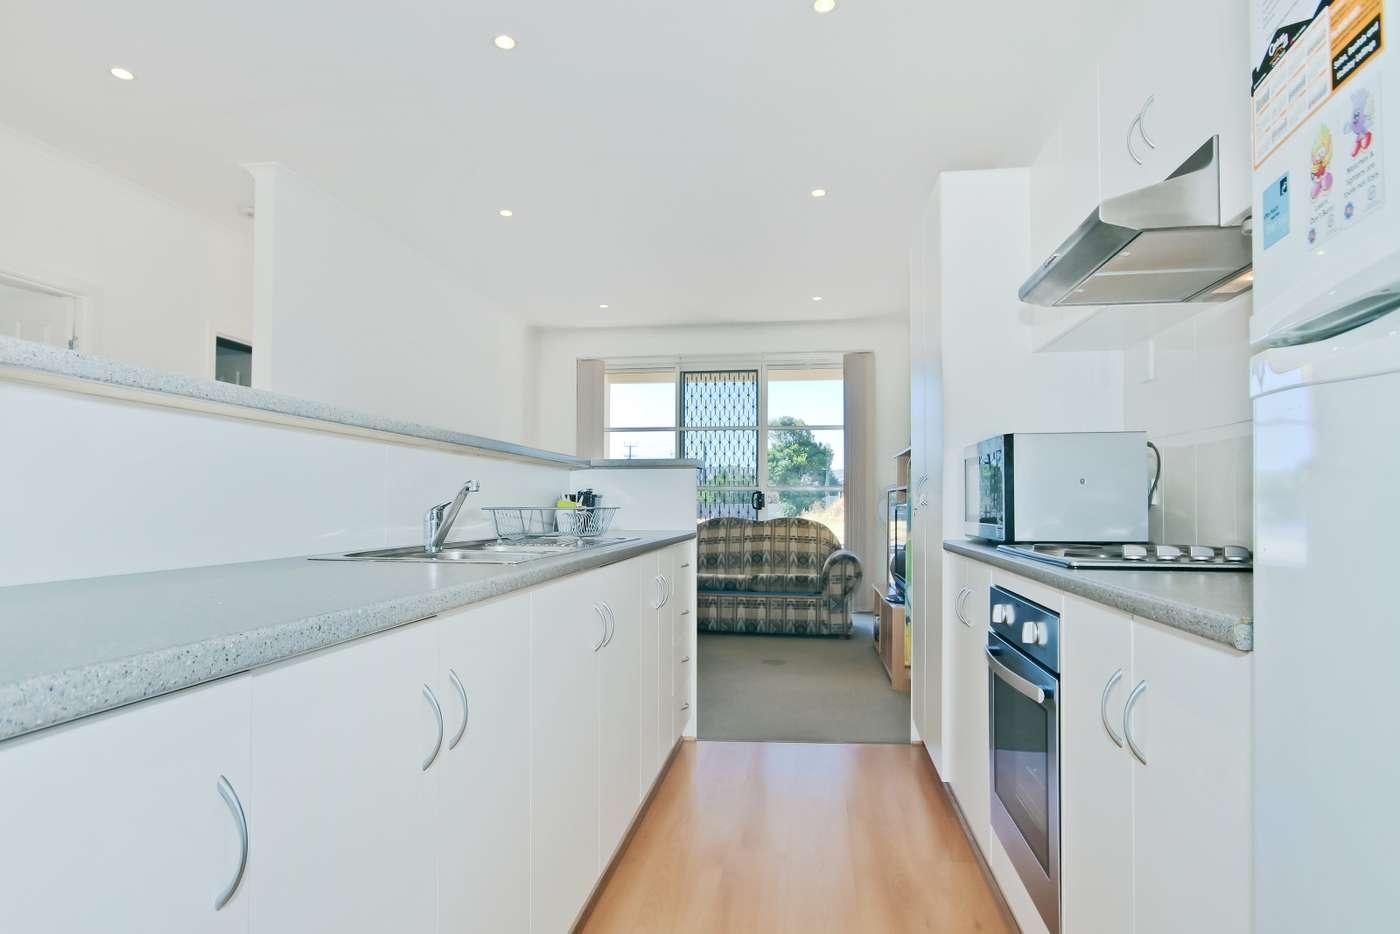 Main view of Homely house listing, 65 Gordon Street, Aldinga Beach SA 5173